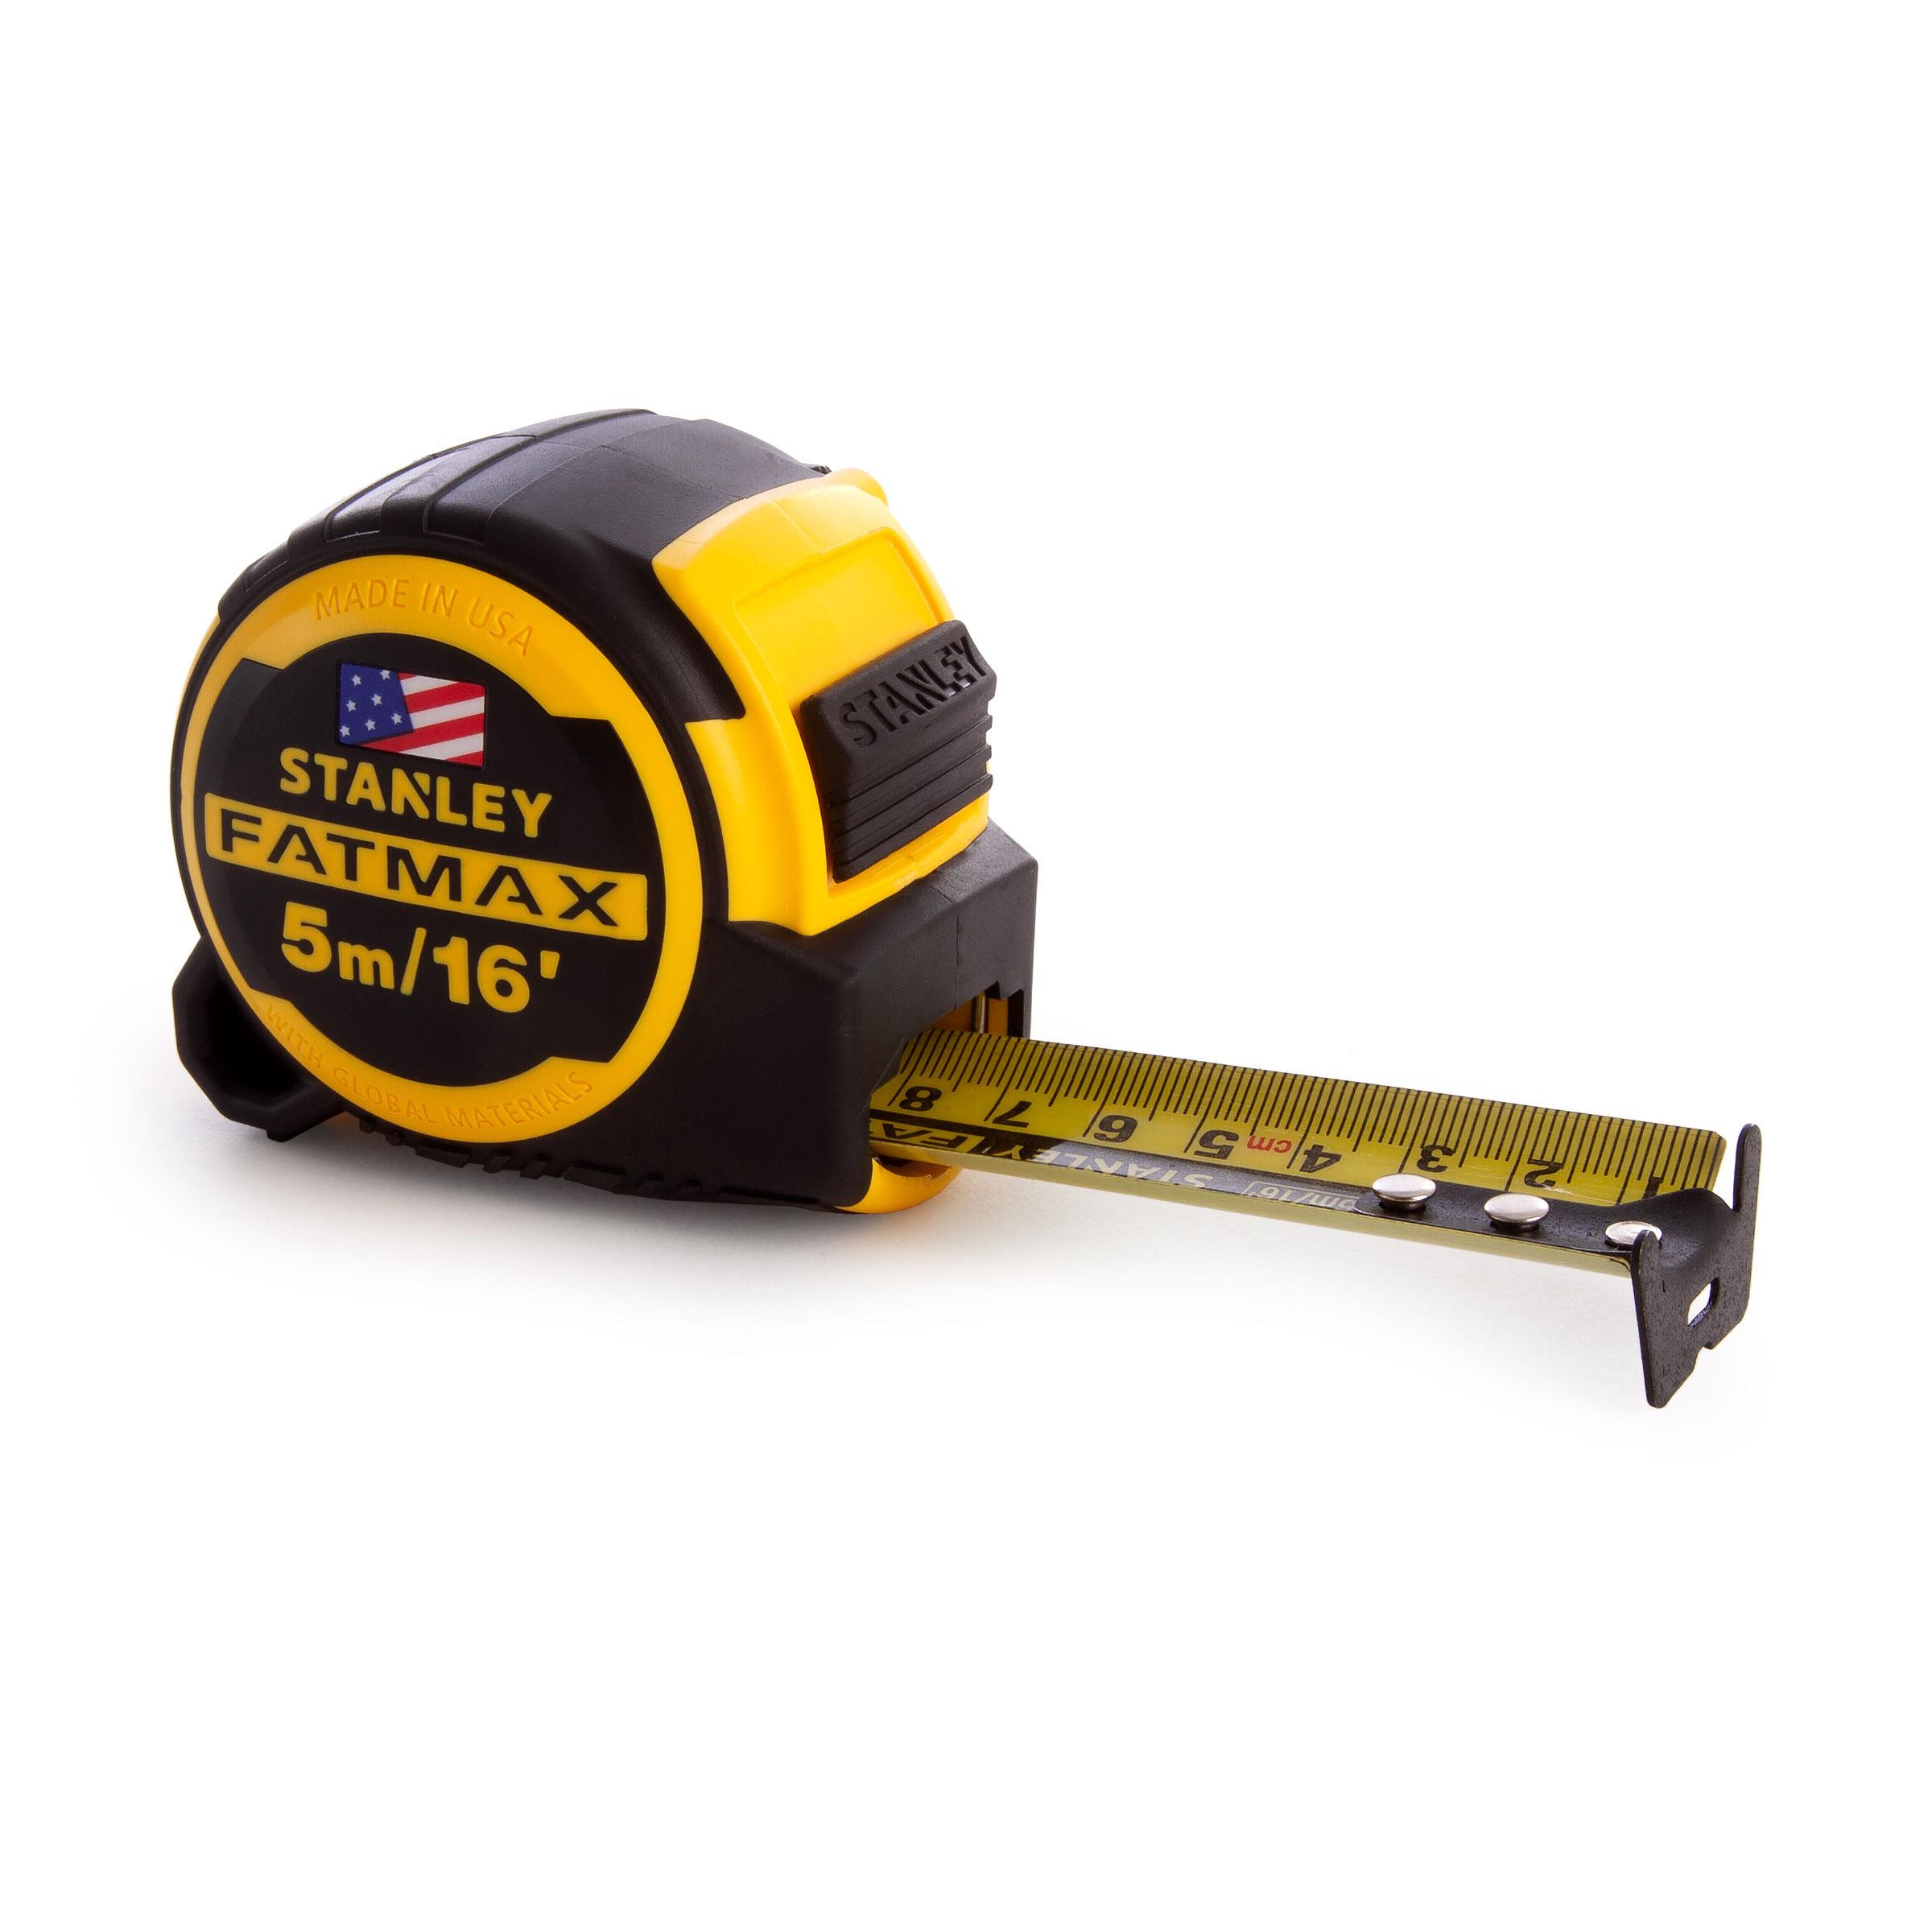 Stanley FMHT36317-0 FatMax Next Generation Tape Measure 5m/26feet